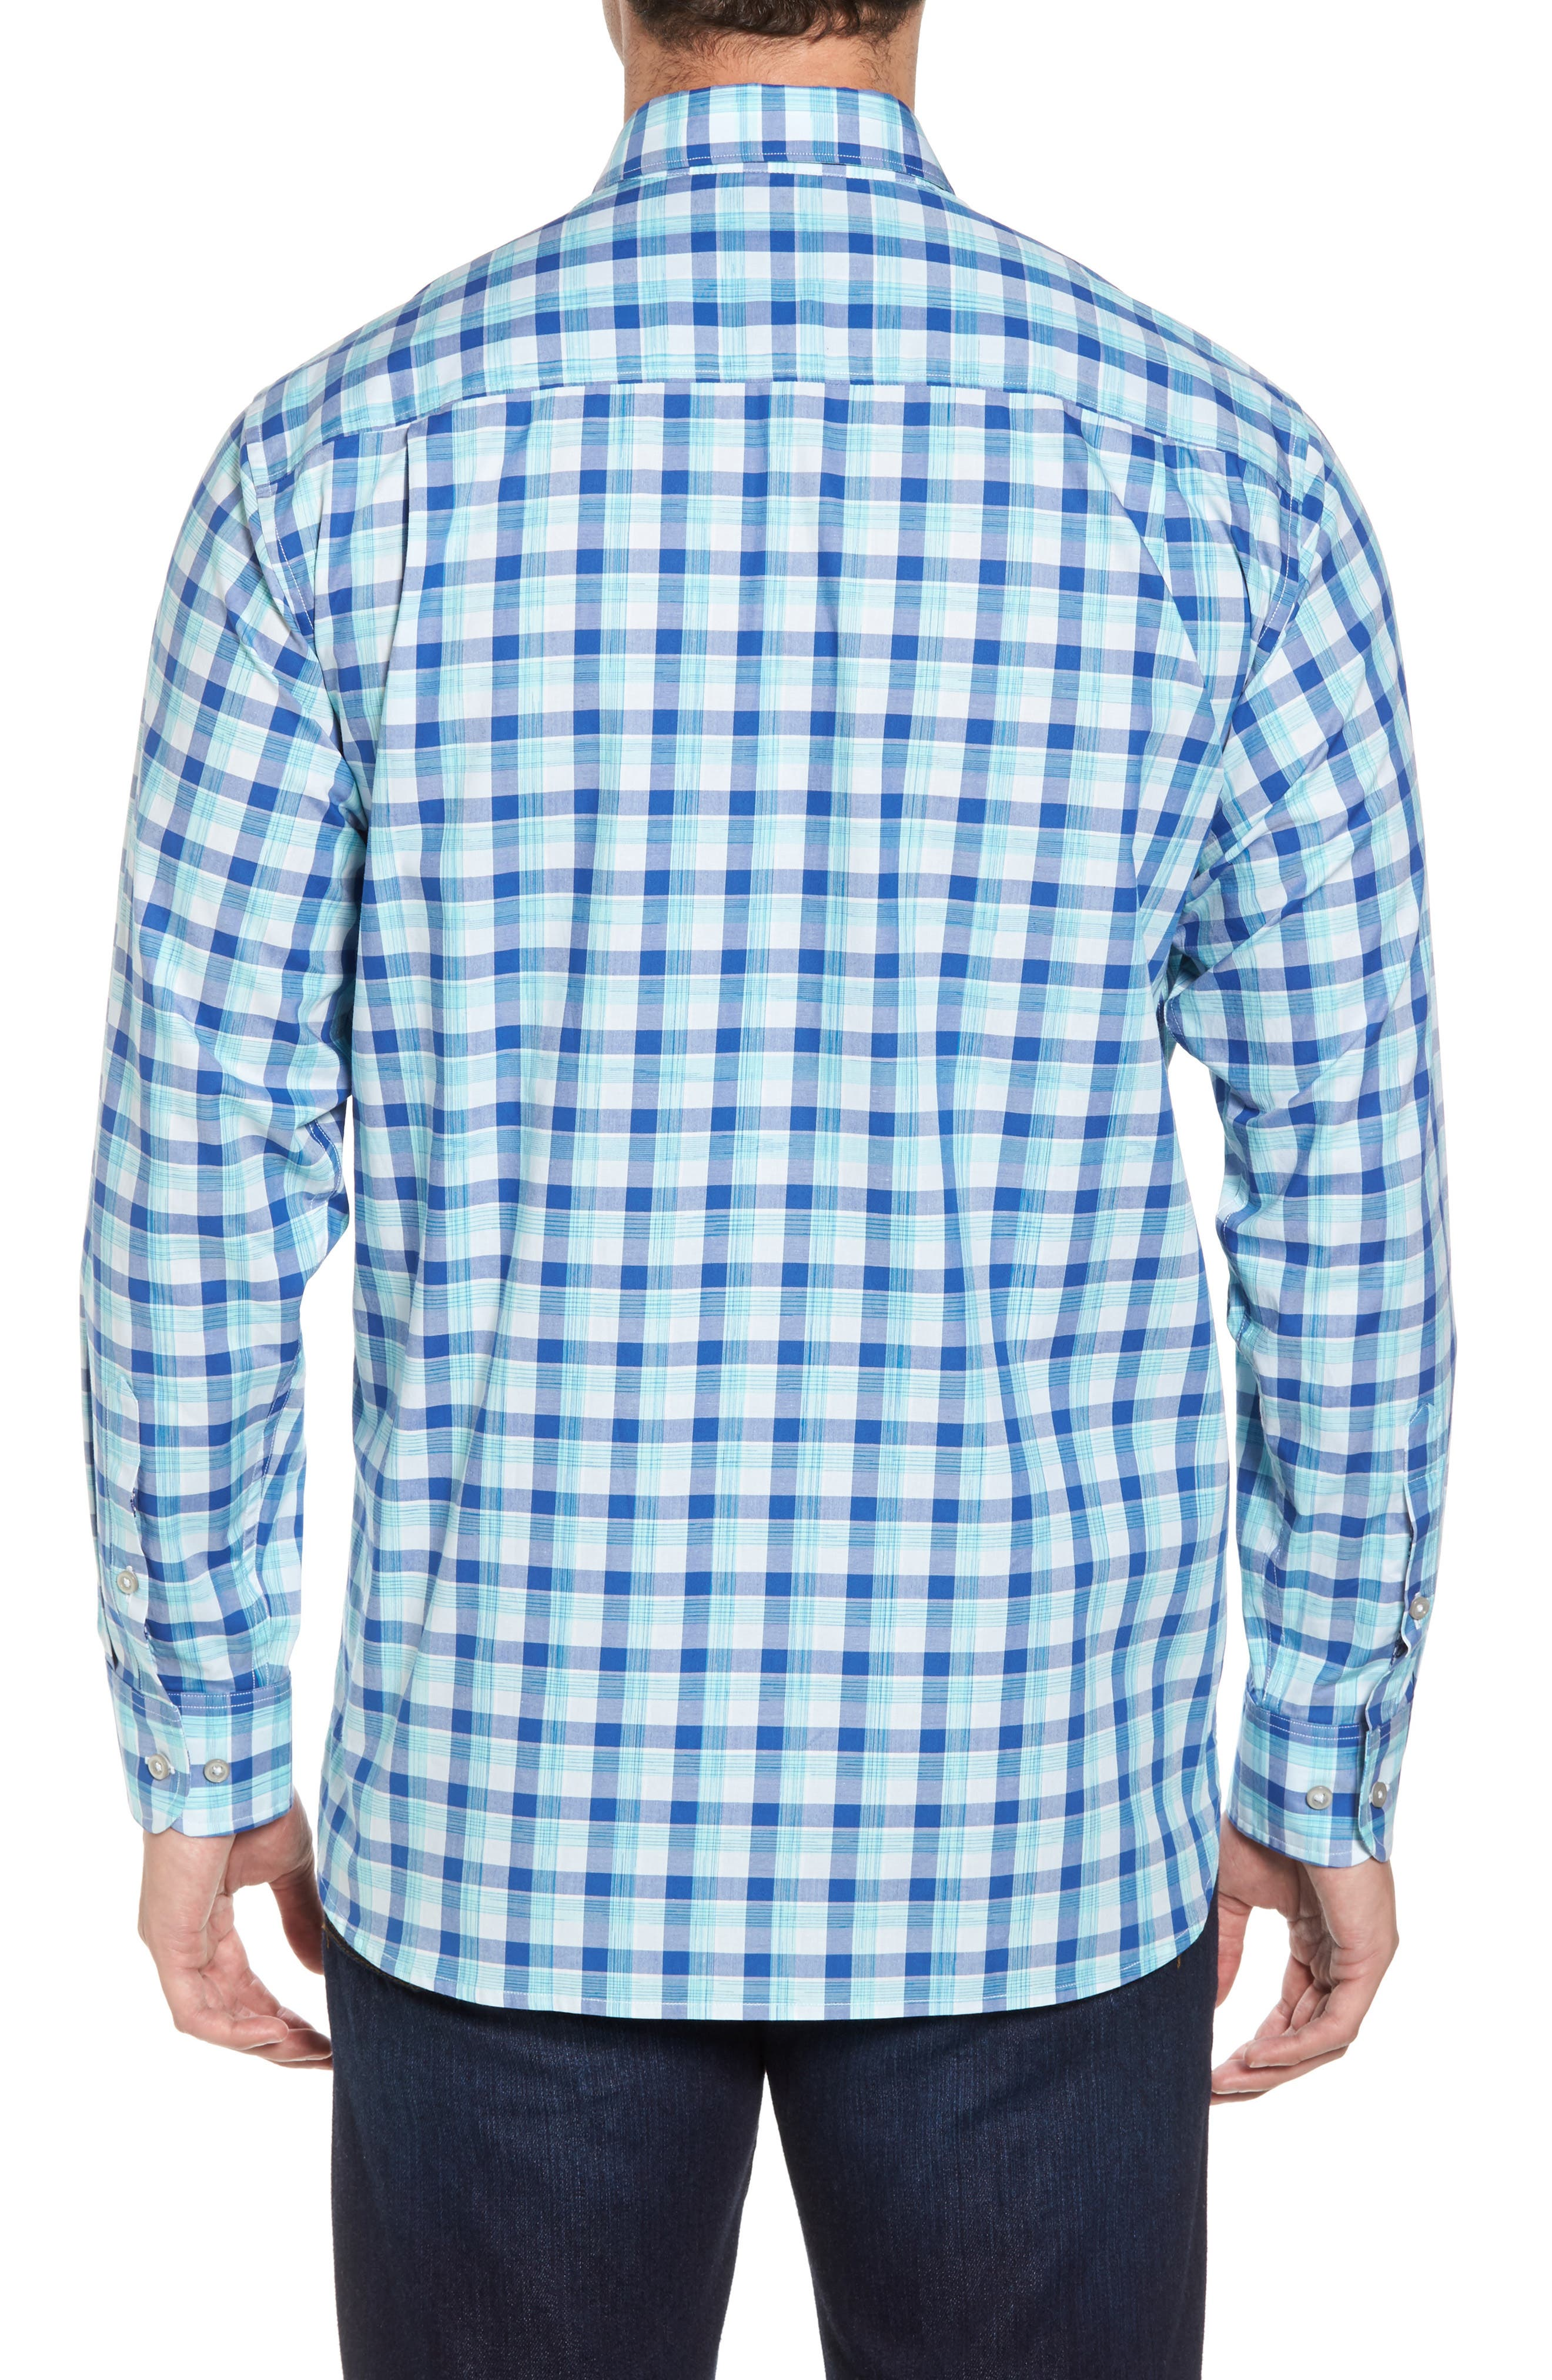 Atlantic Tides Classic Fit Plaid Sport Shirt,                             Alternate thumbnail 2, color,                             Galaxy Blue